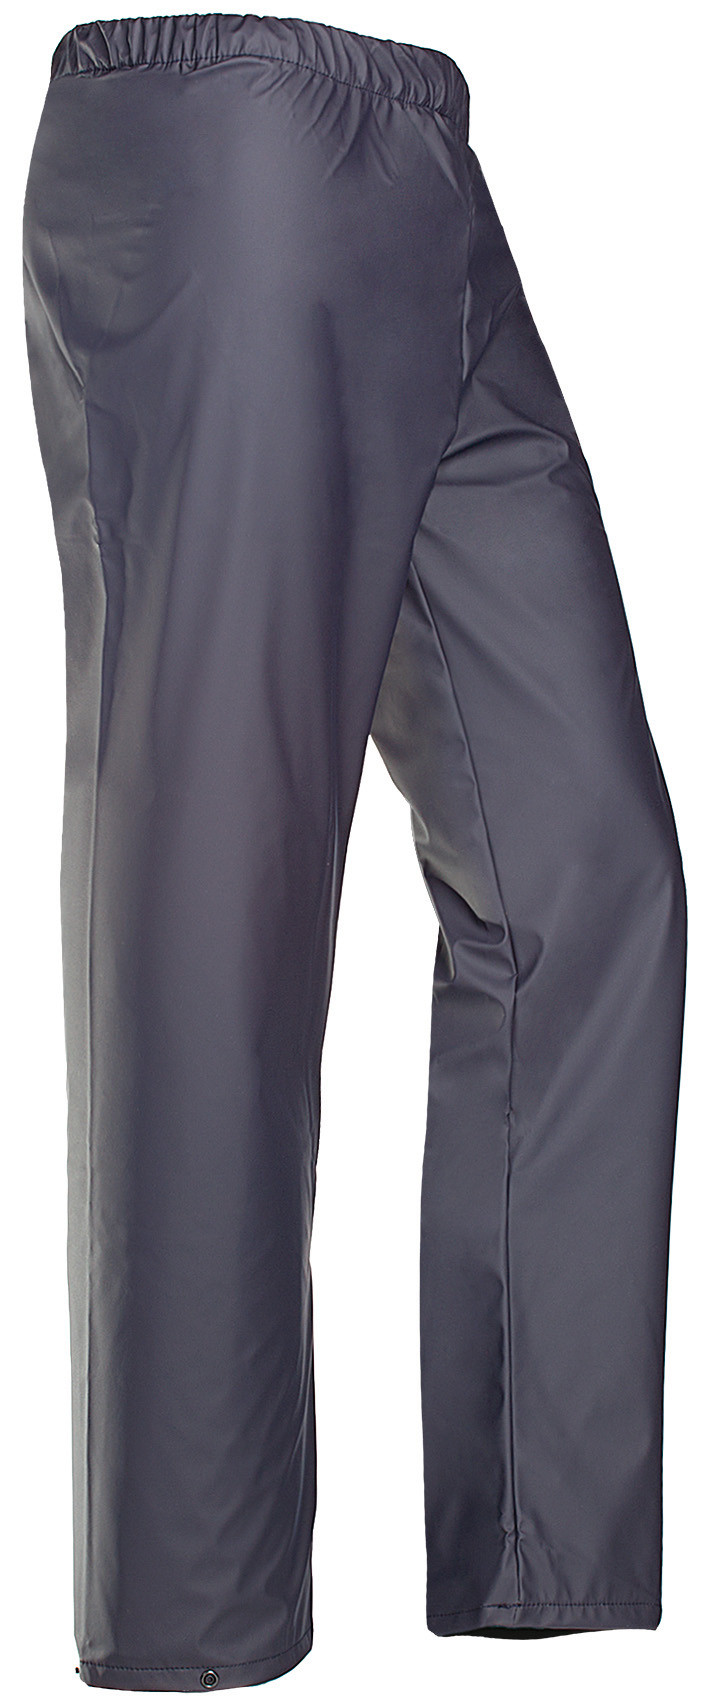 Trouser Navy Flexothane (XL) 6360